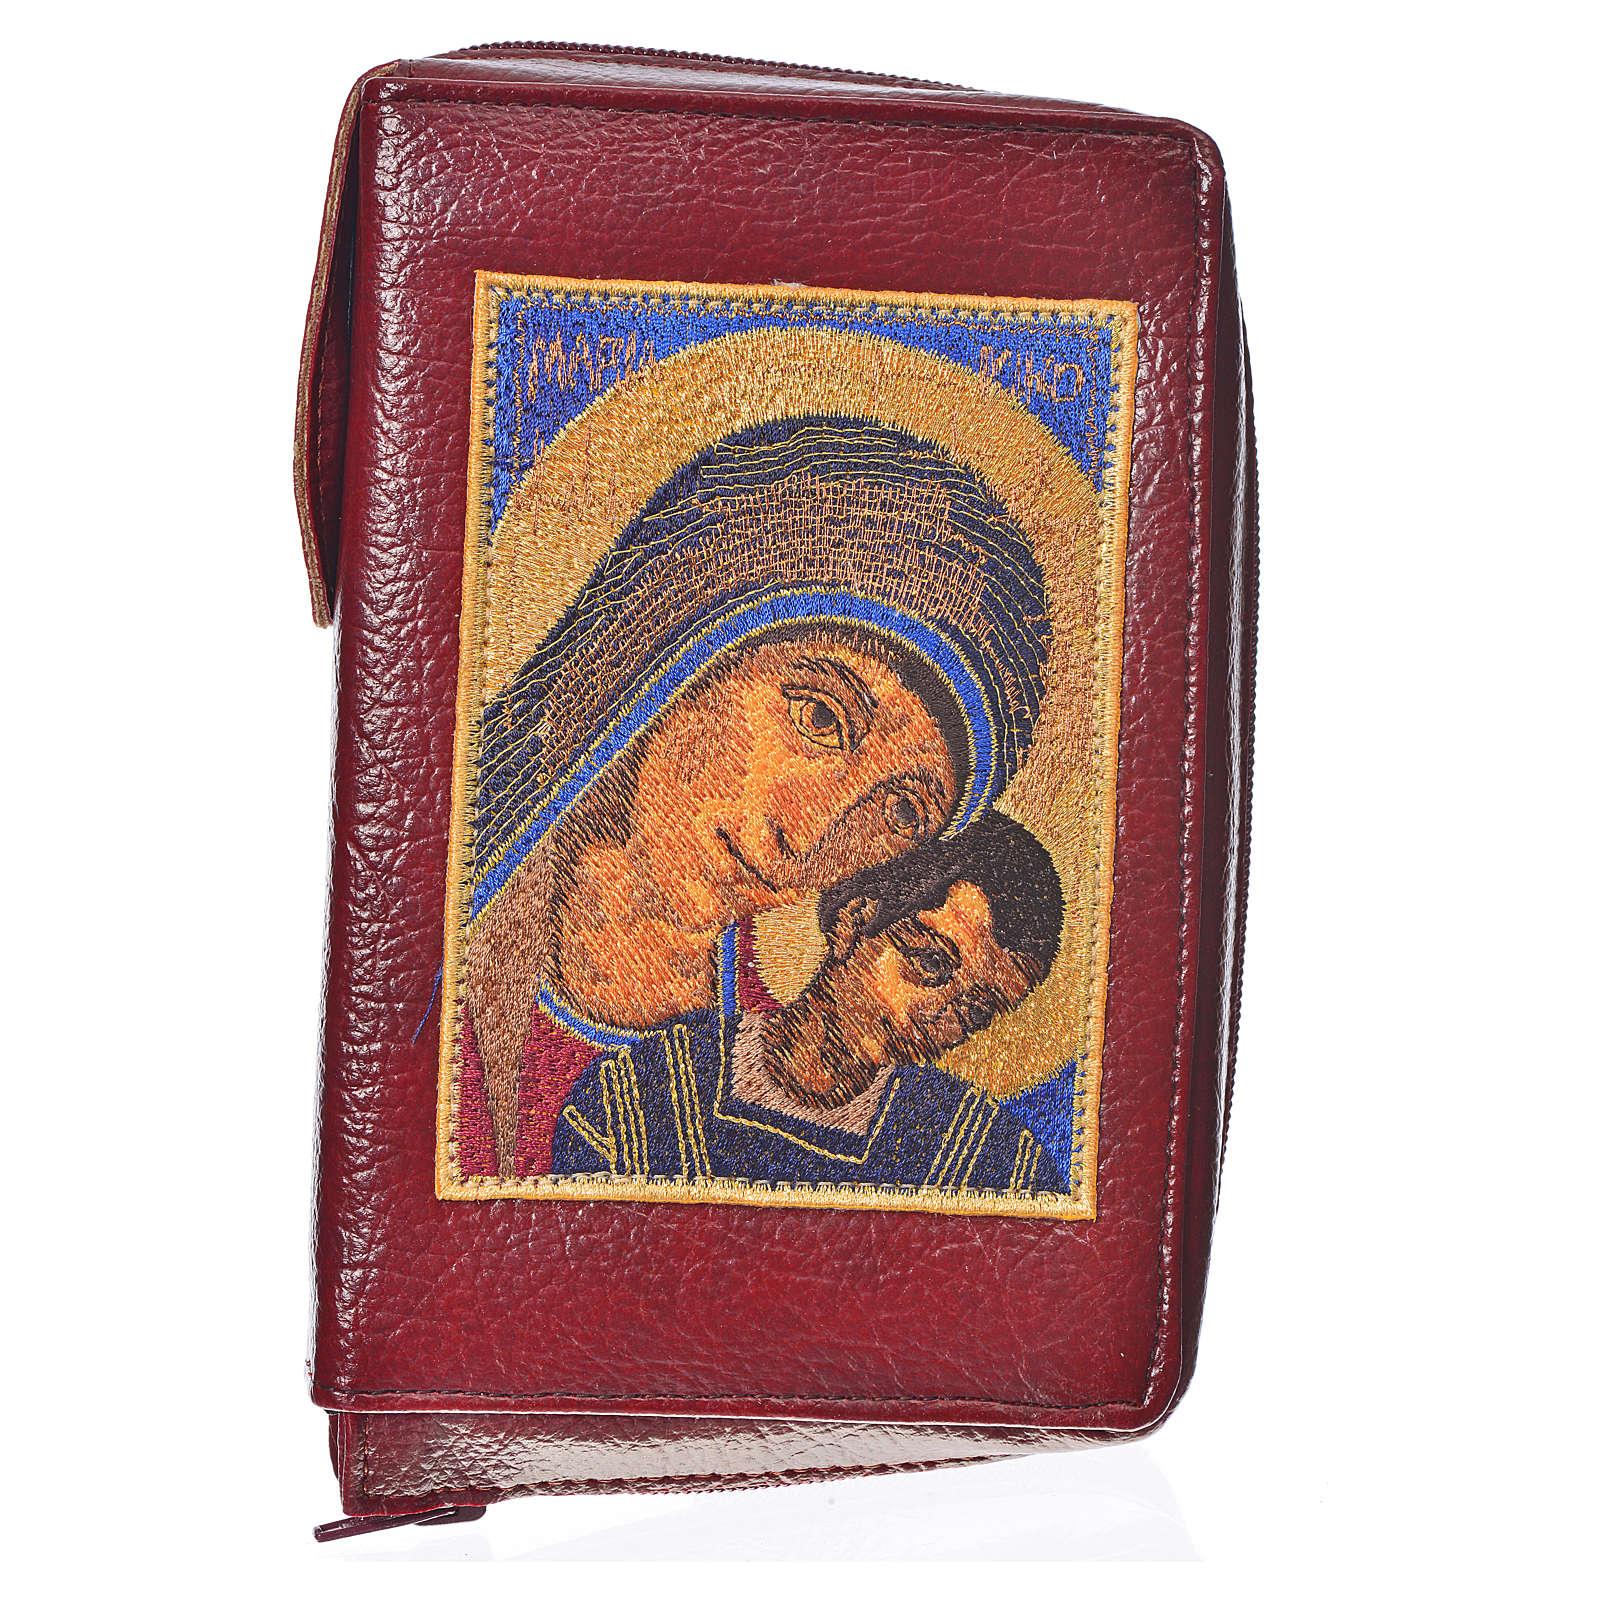 Funda Sagrada Biblia CEE ED. Pop. burdeos Virgen de Kiko 4